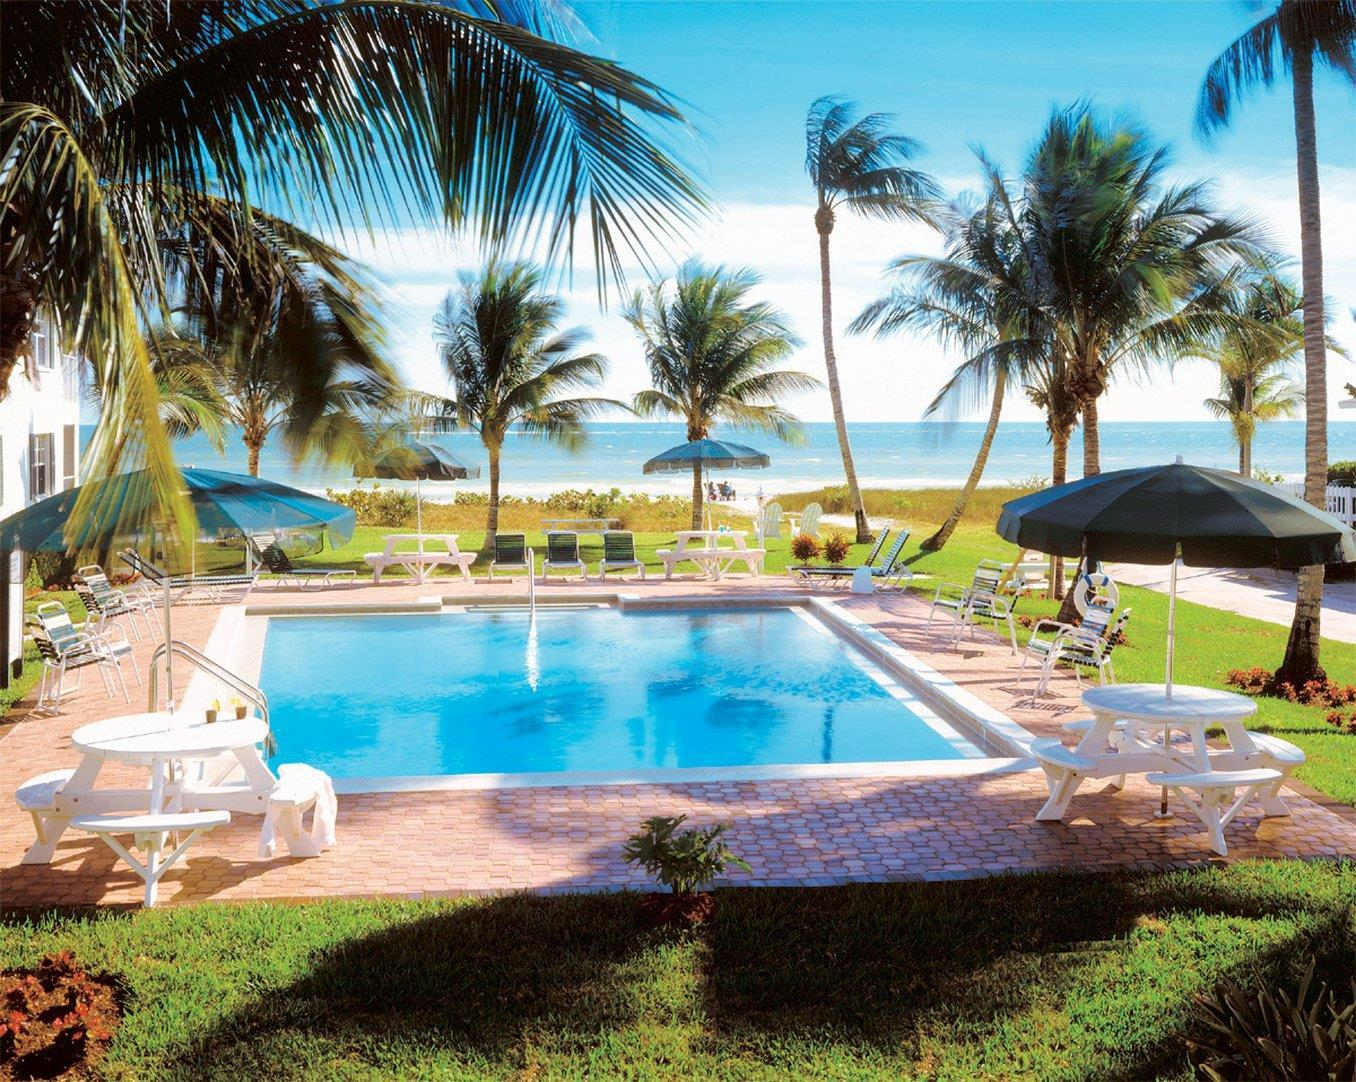 Sanibel Island Resorts: Sanibel's Seaside Inn Sanibel Island, FL